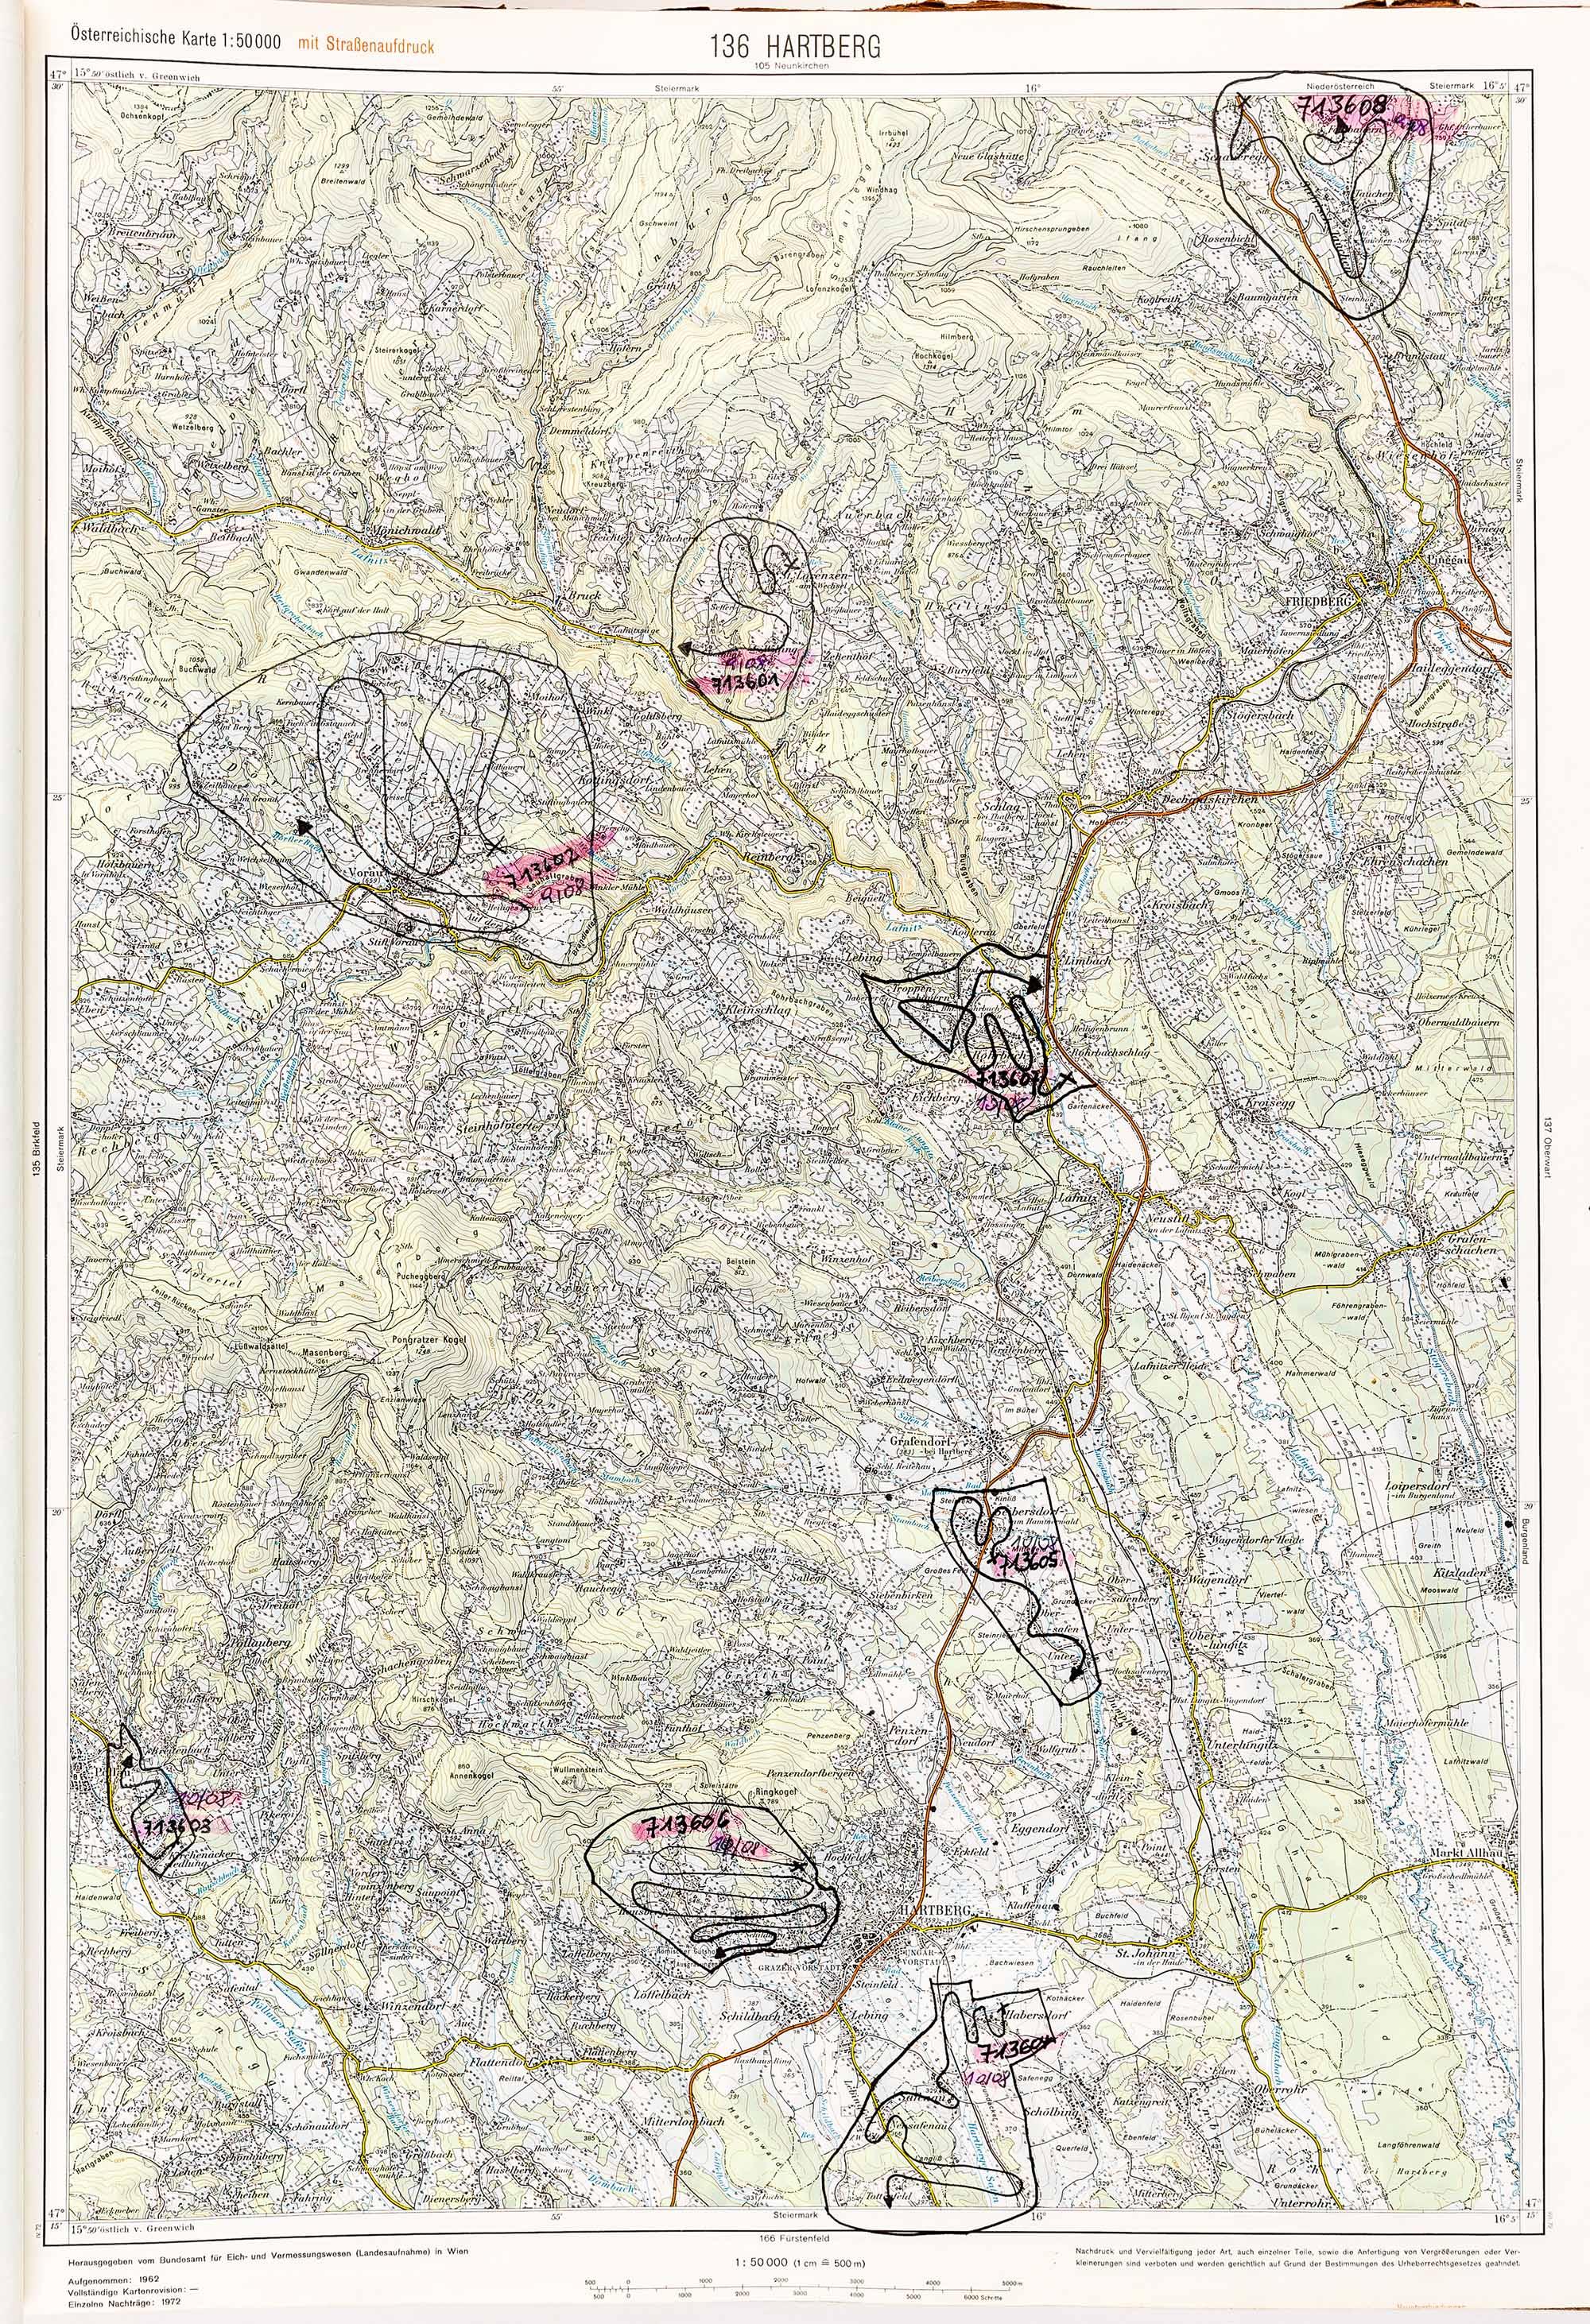 1975-1979 Karte 136